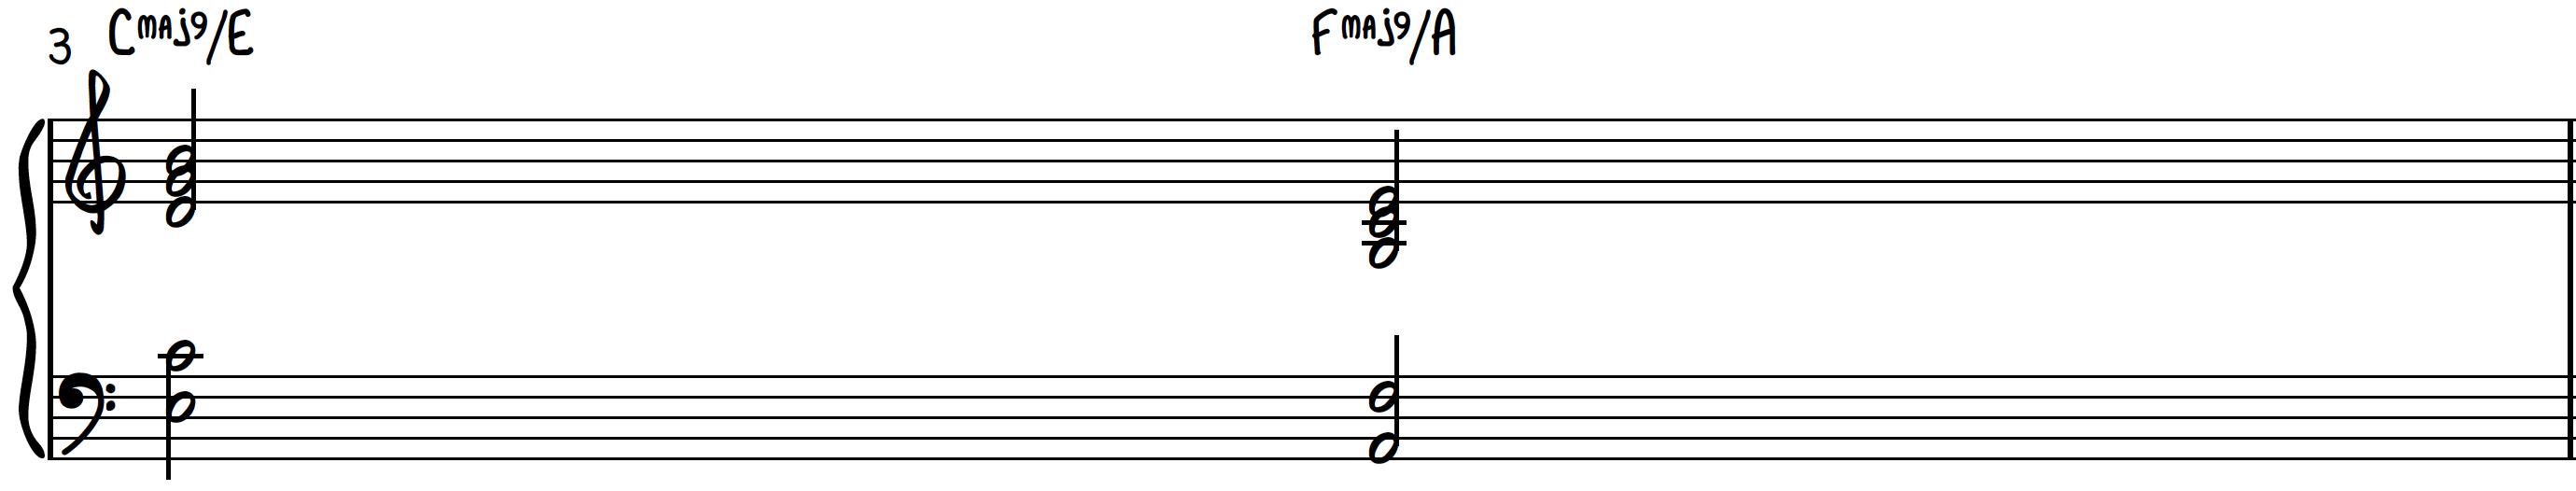 C Heaven Chord to F Heaven Chord on piano